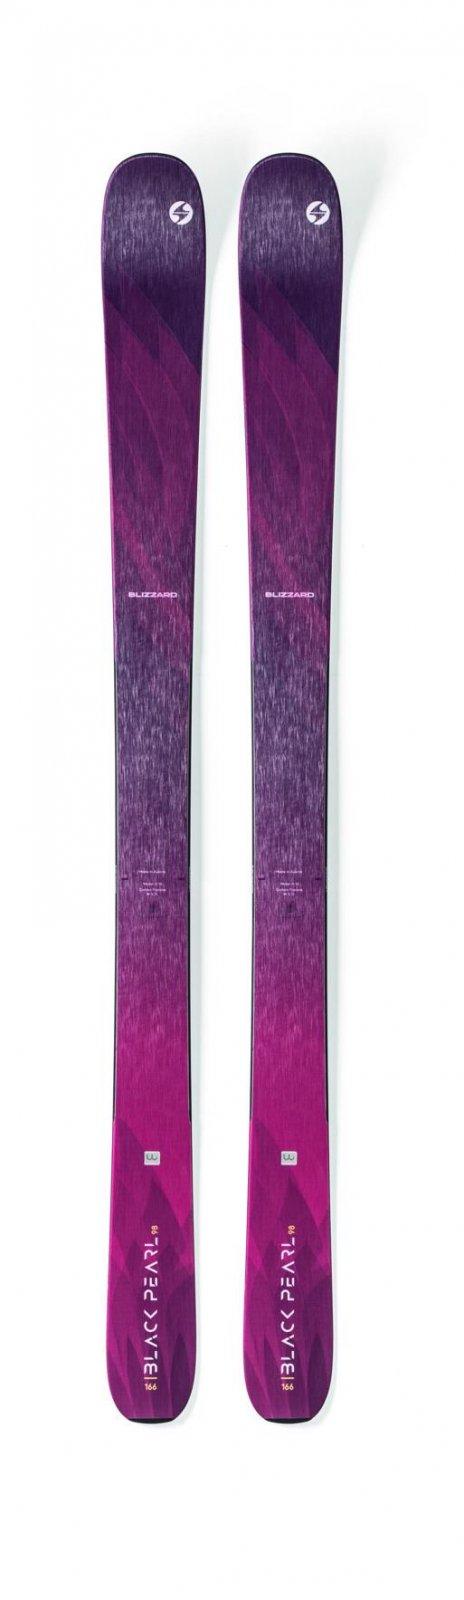 Blizzard Black Pearl 98 Skis 2020